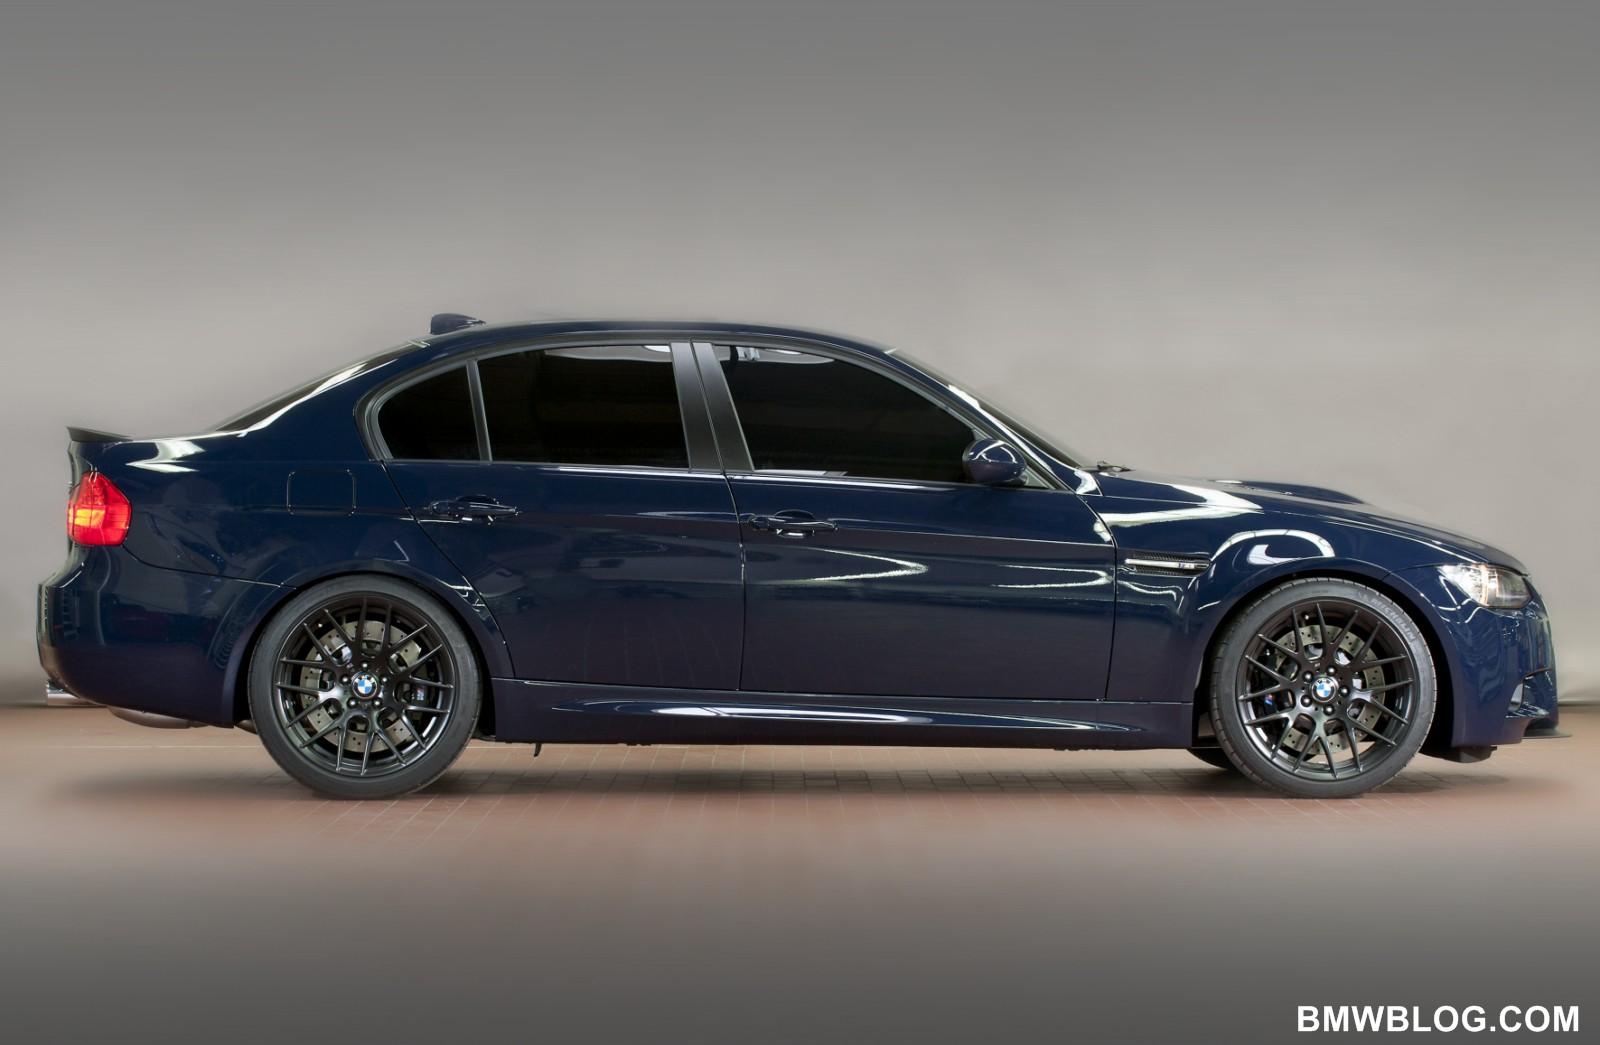 BMW M3 Lightweight to be called M3 Sedan GTS - 440 hp